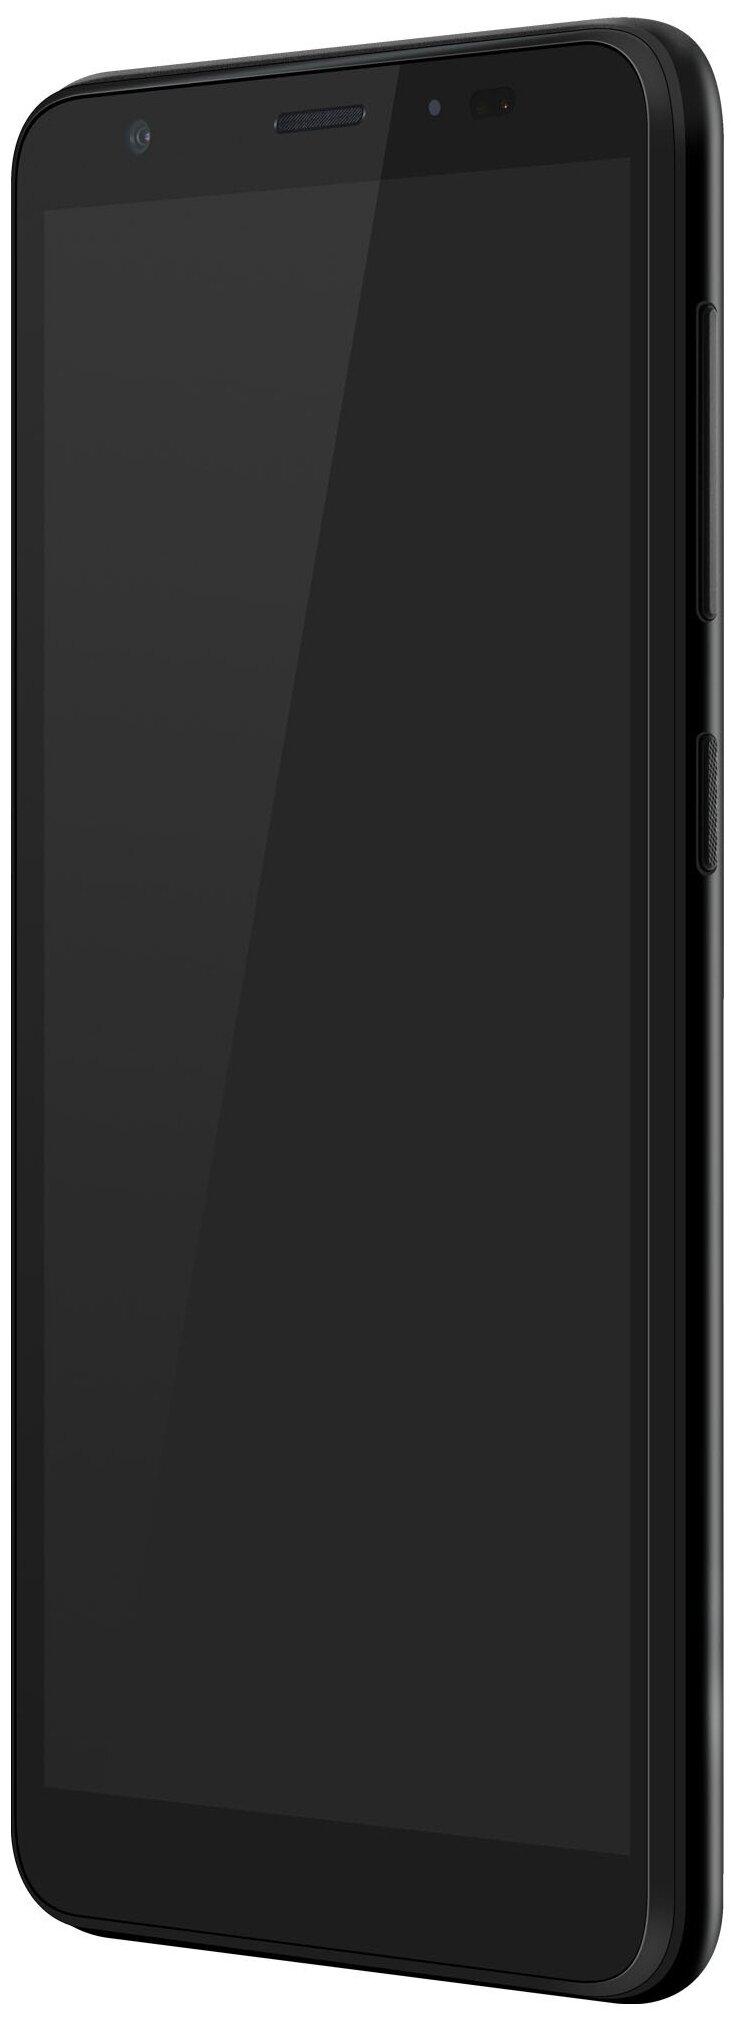 ZTE Blade A5 (2019) 2/32GB - оперативная память: 2ГБ